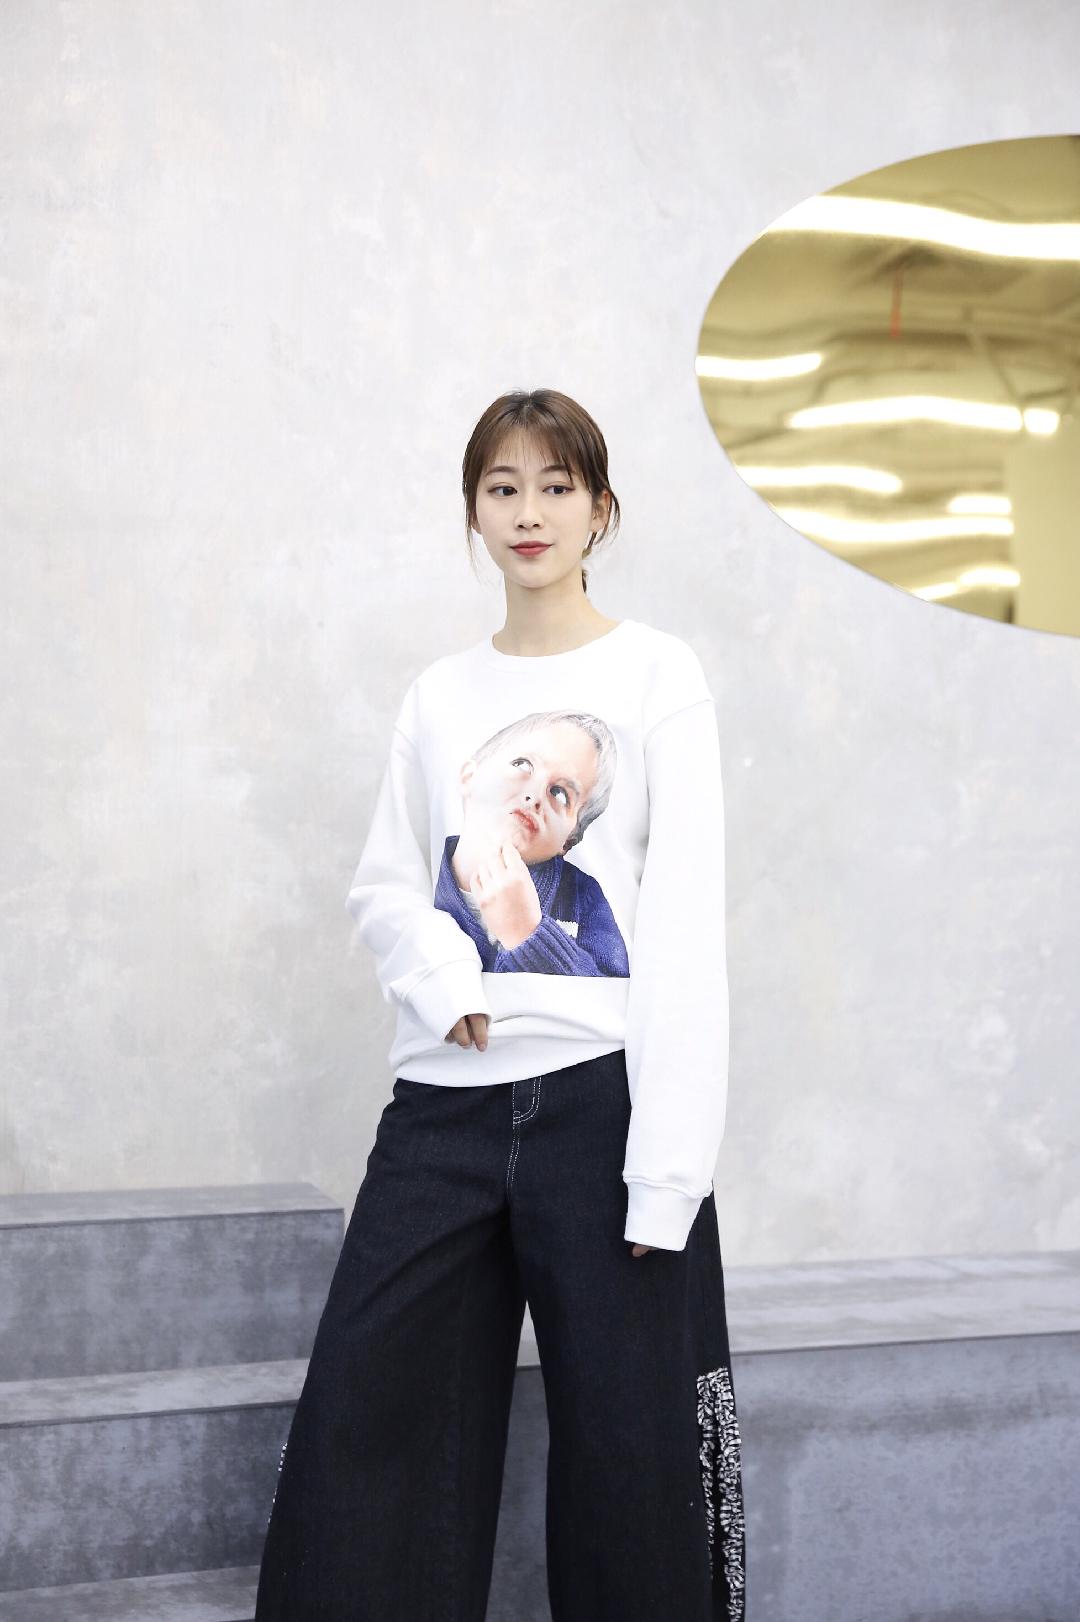 #MOGU STUDIO# 【POPO穿搭】🖤🖤白色卫衣搭配阔腿牛仔裤,很简单的一套搭配,但卫衣上可爱的印花和牛仔裤开衩花边的设计都让整体看上去不那么单调!